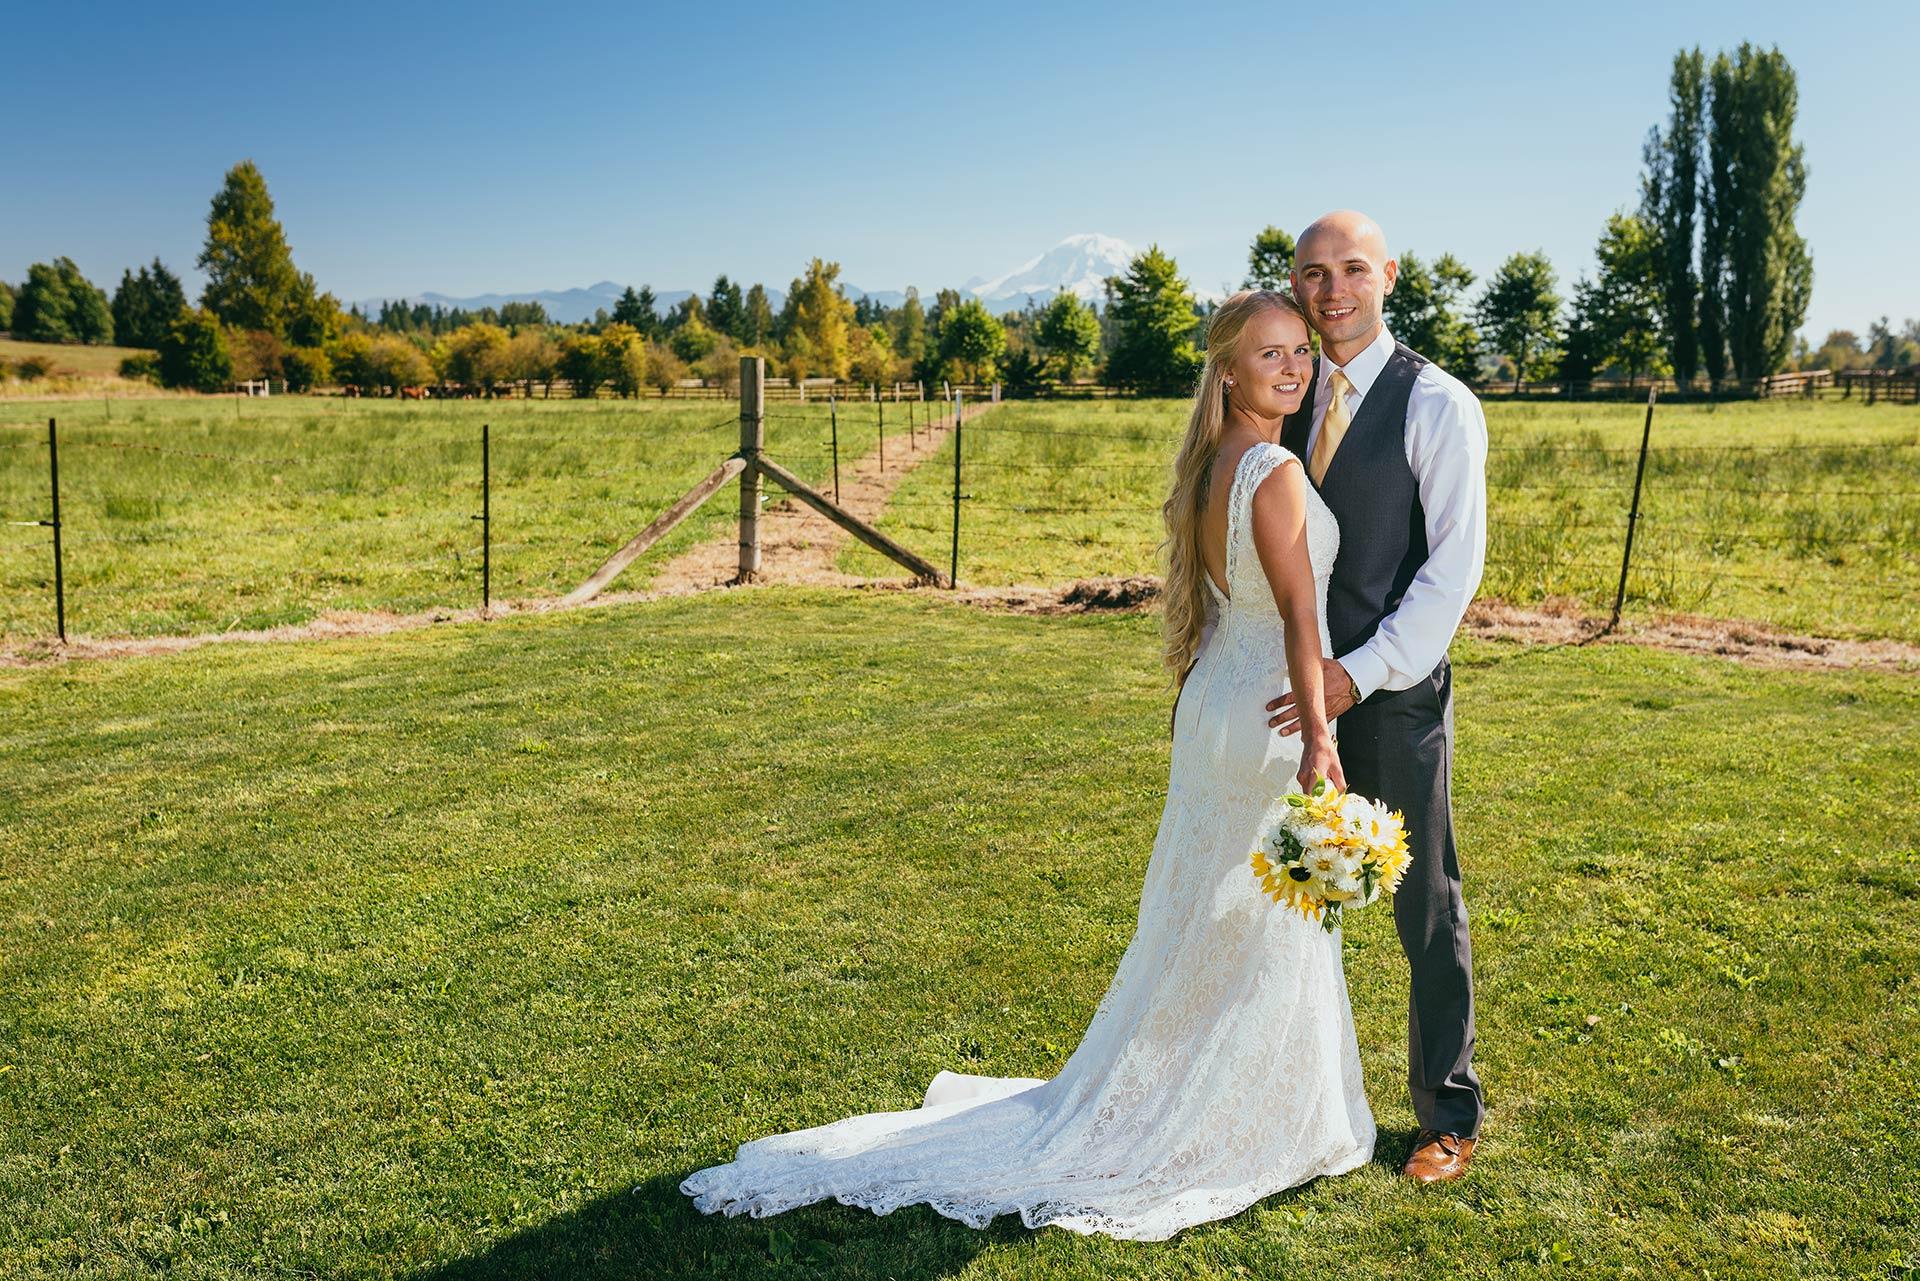 Szelachowski-Triplett Wedding